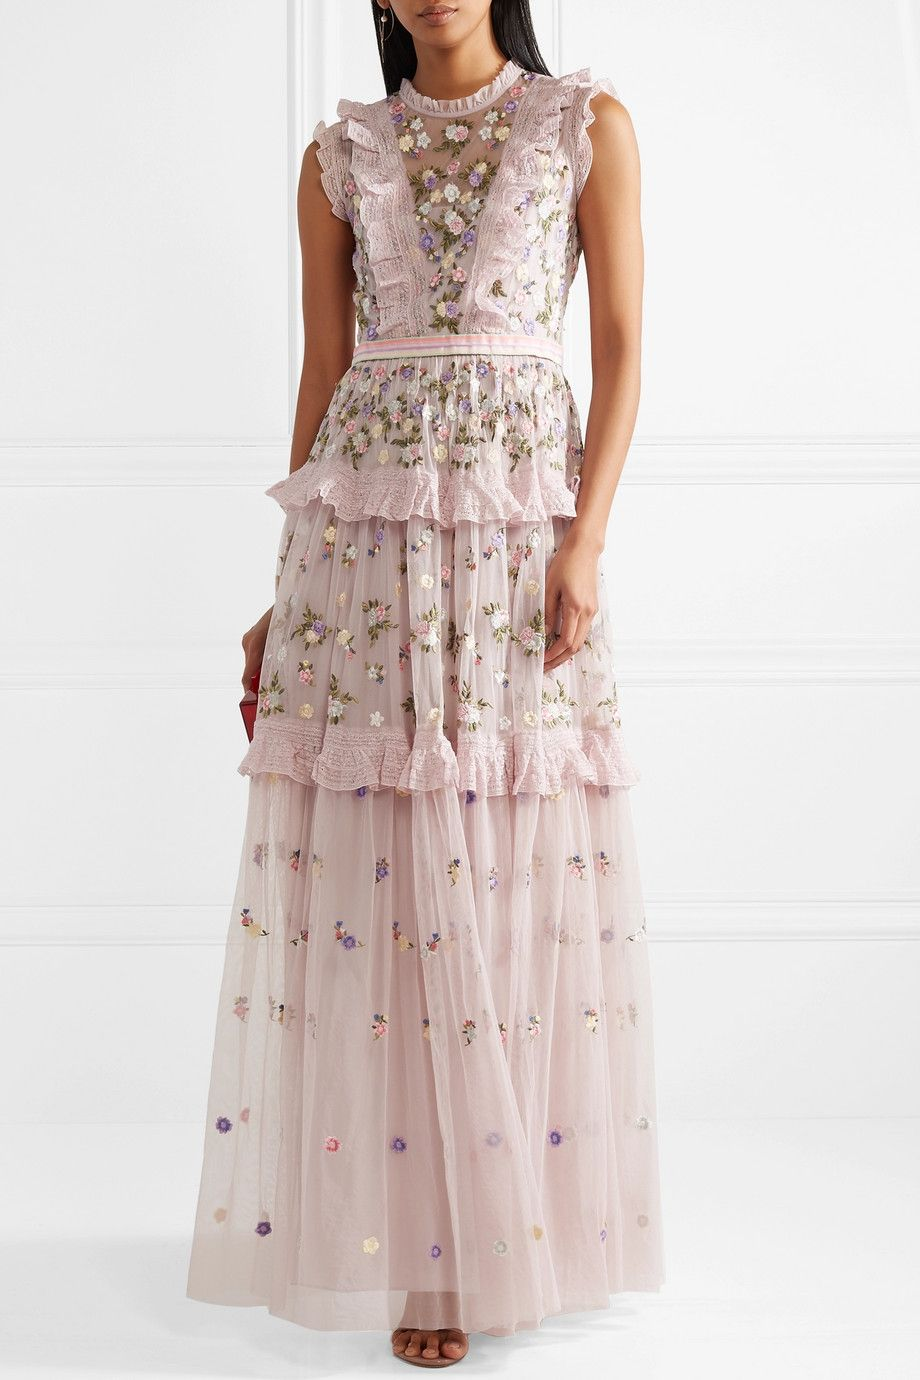 Matrimonio Shabby Chic Outfit : Outfit da matrimonio look color rosa